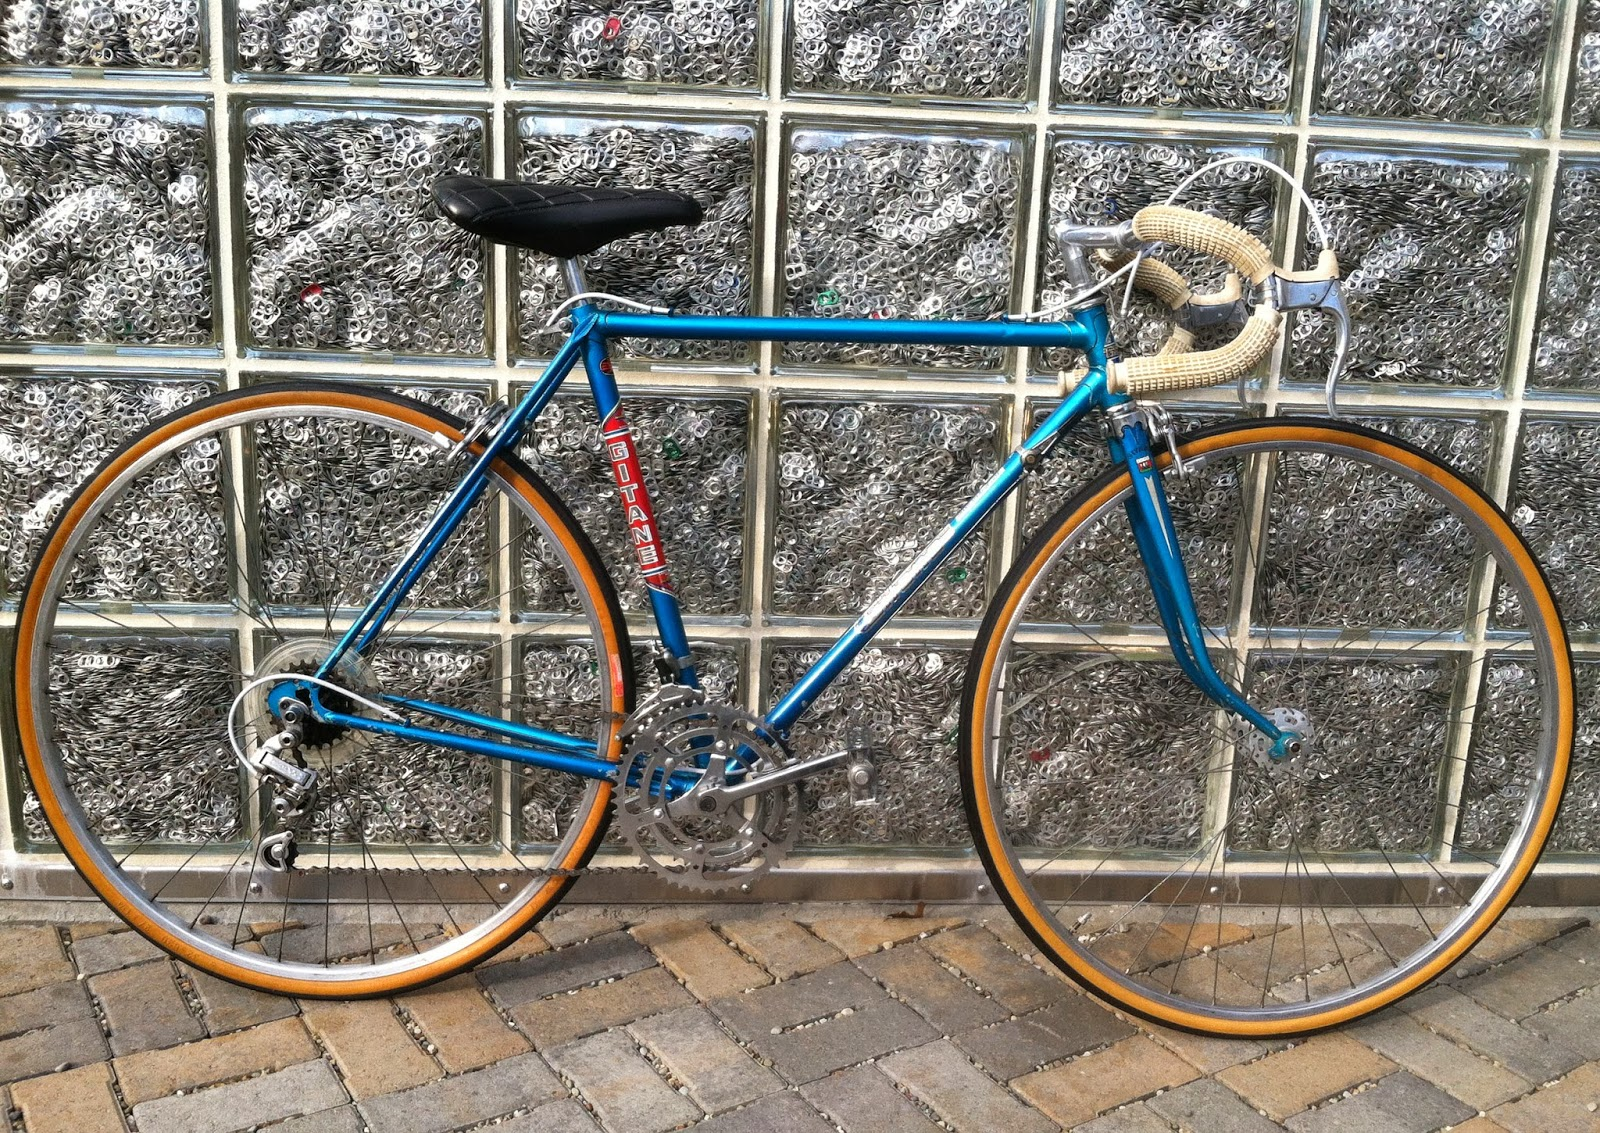 1972 Gitane Grand Sport Deluxe 12 Speed Whistle Bike Collective